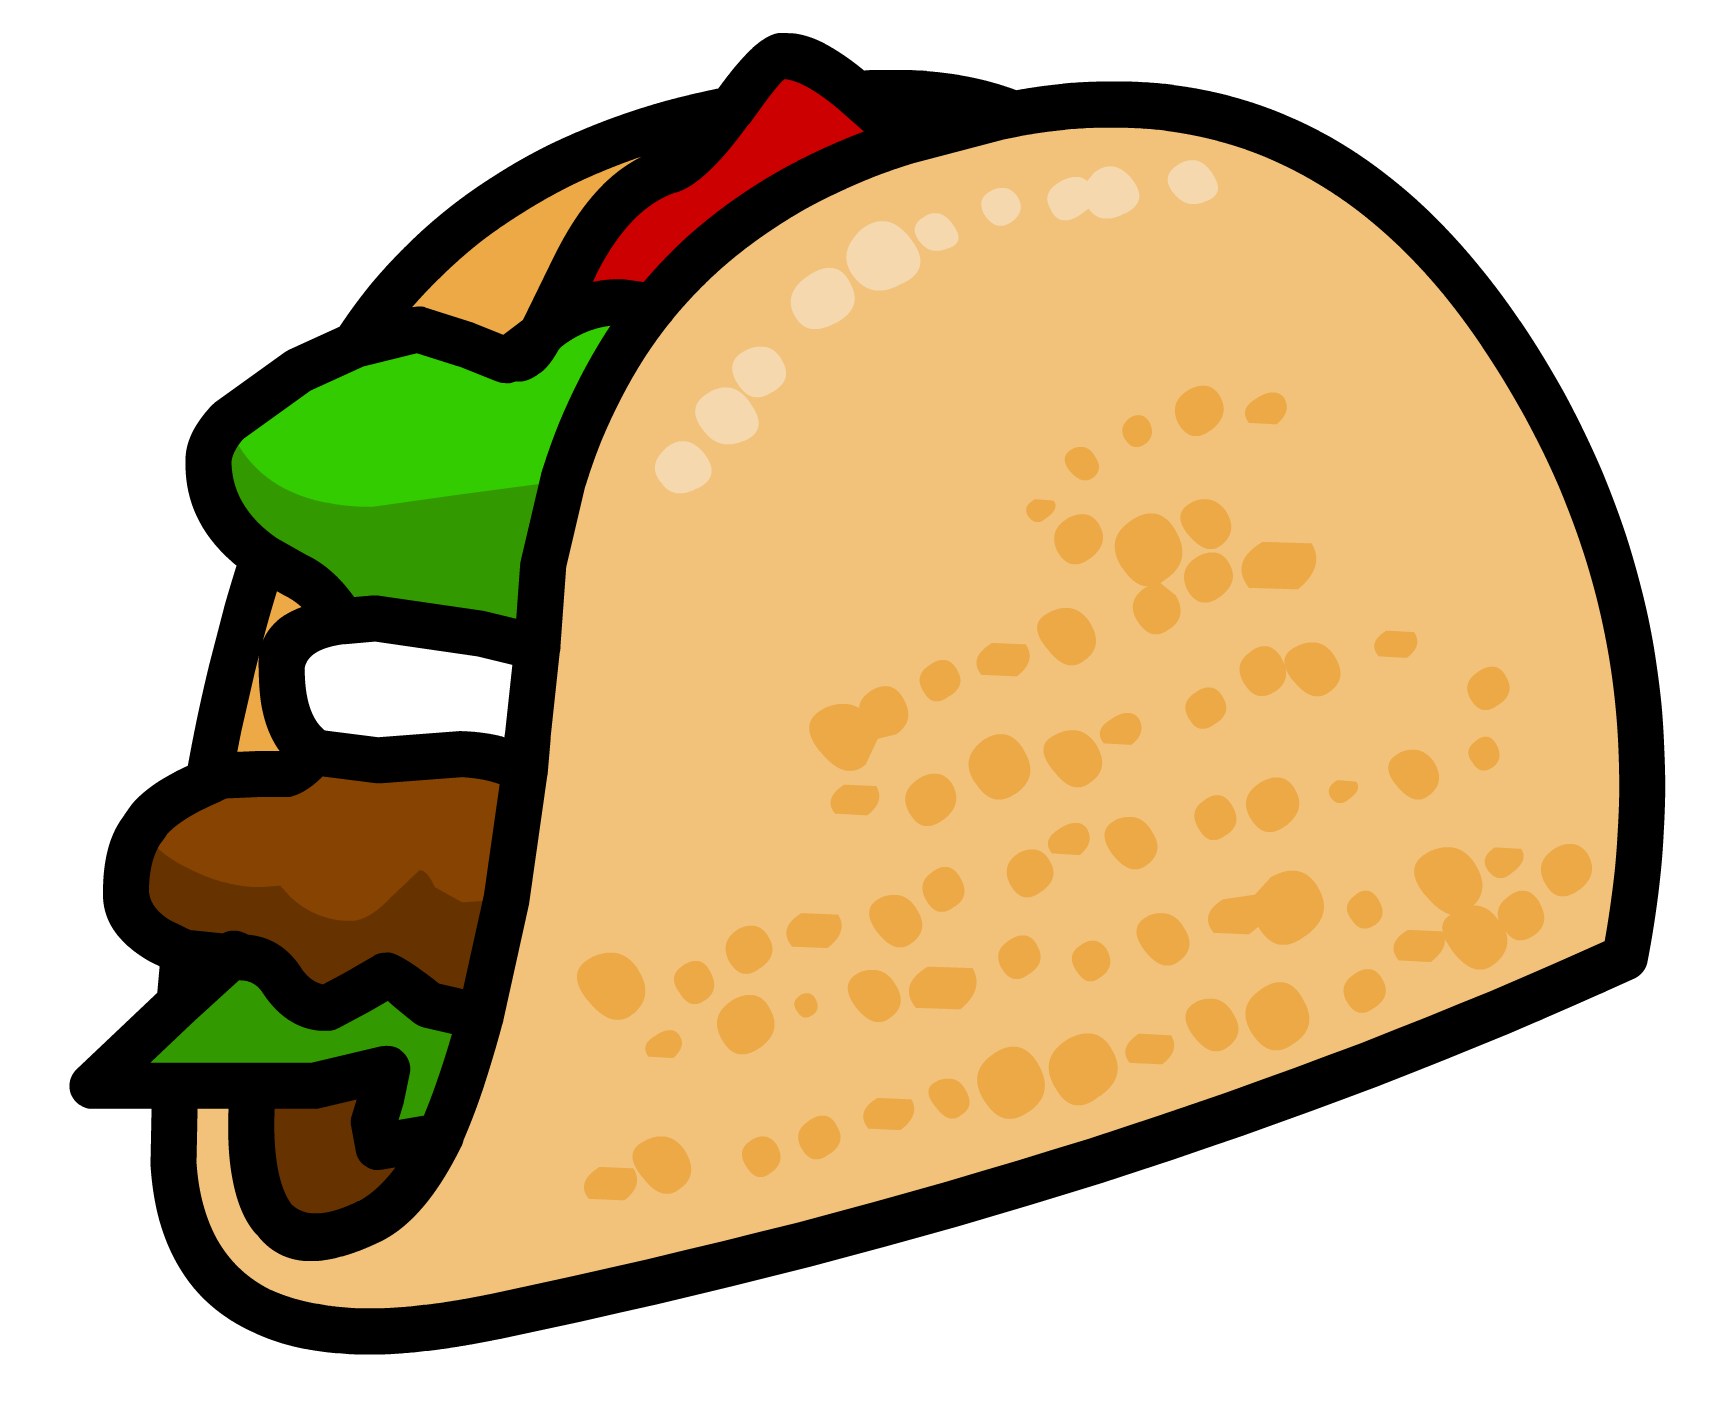 vector royalty free download Image taco pin png. Tacos transparent tumblr